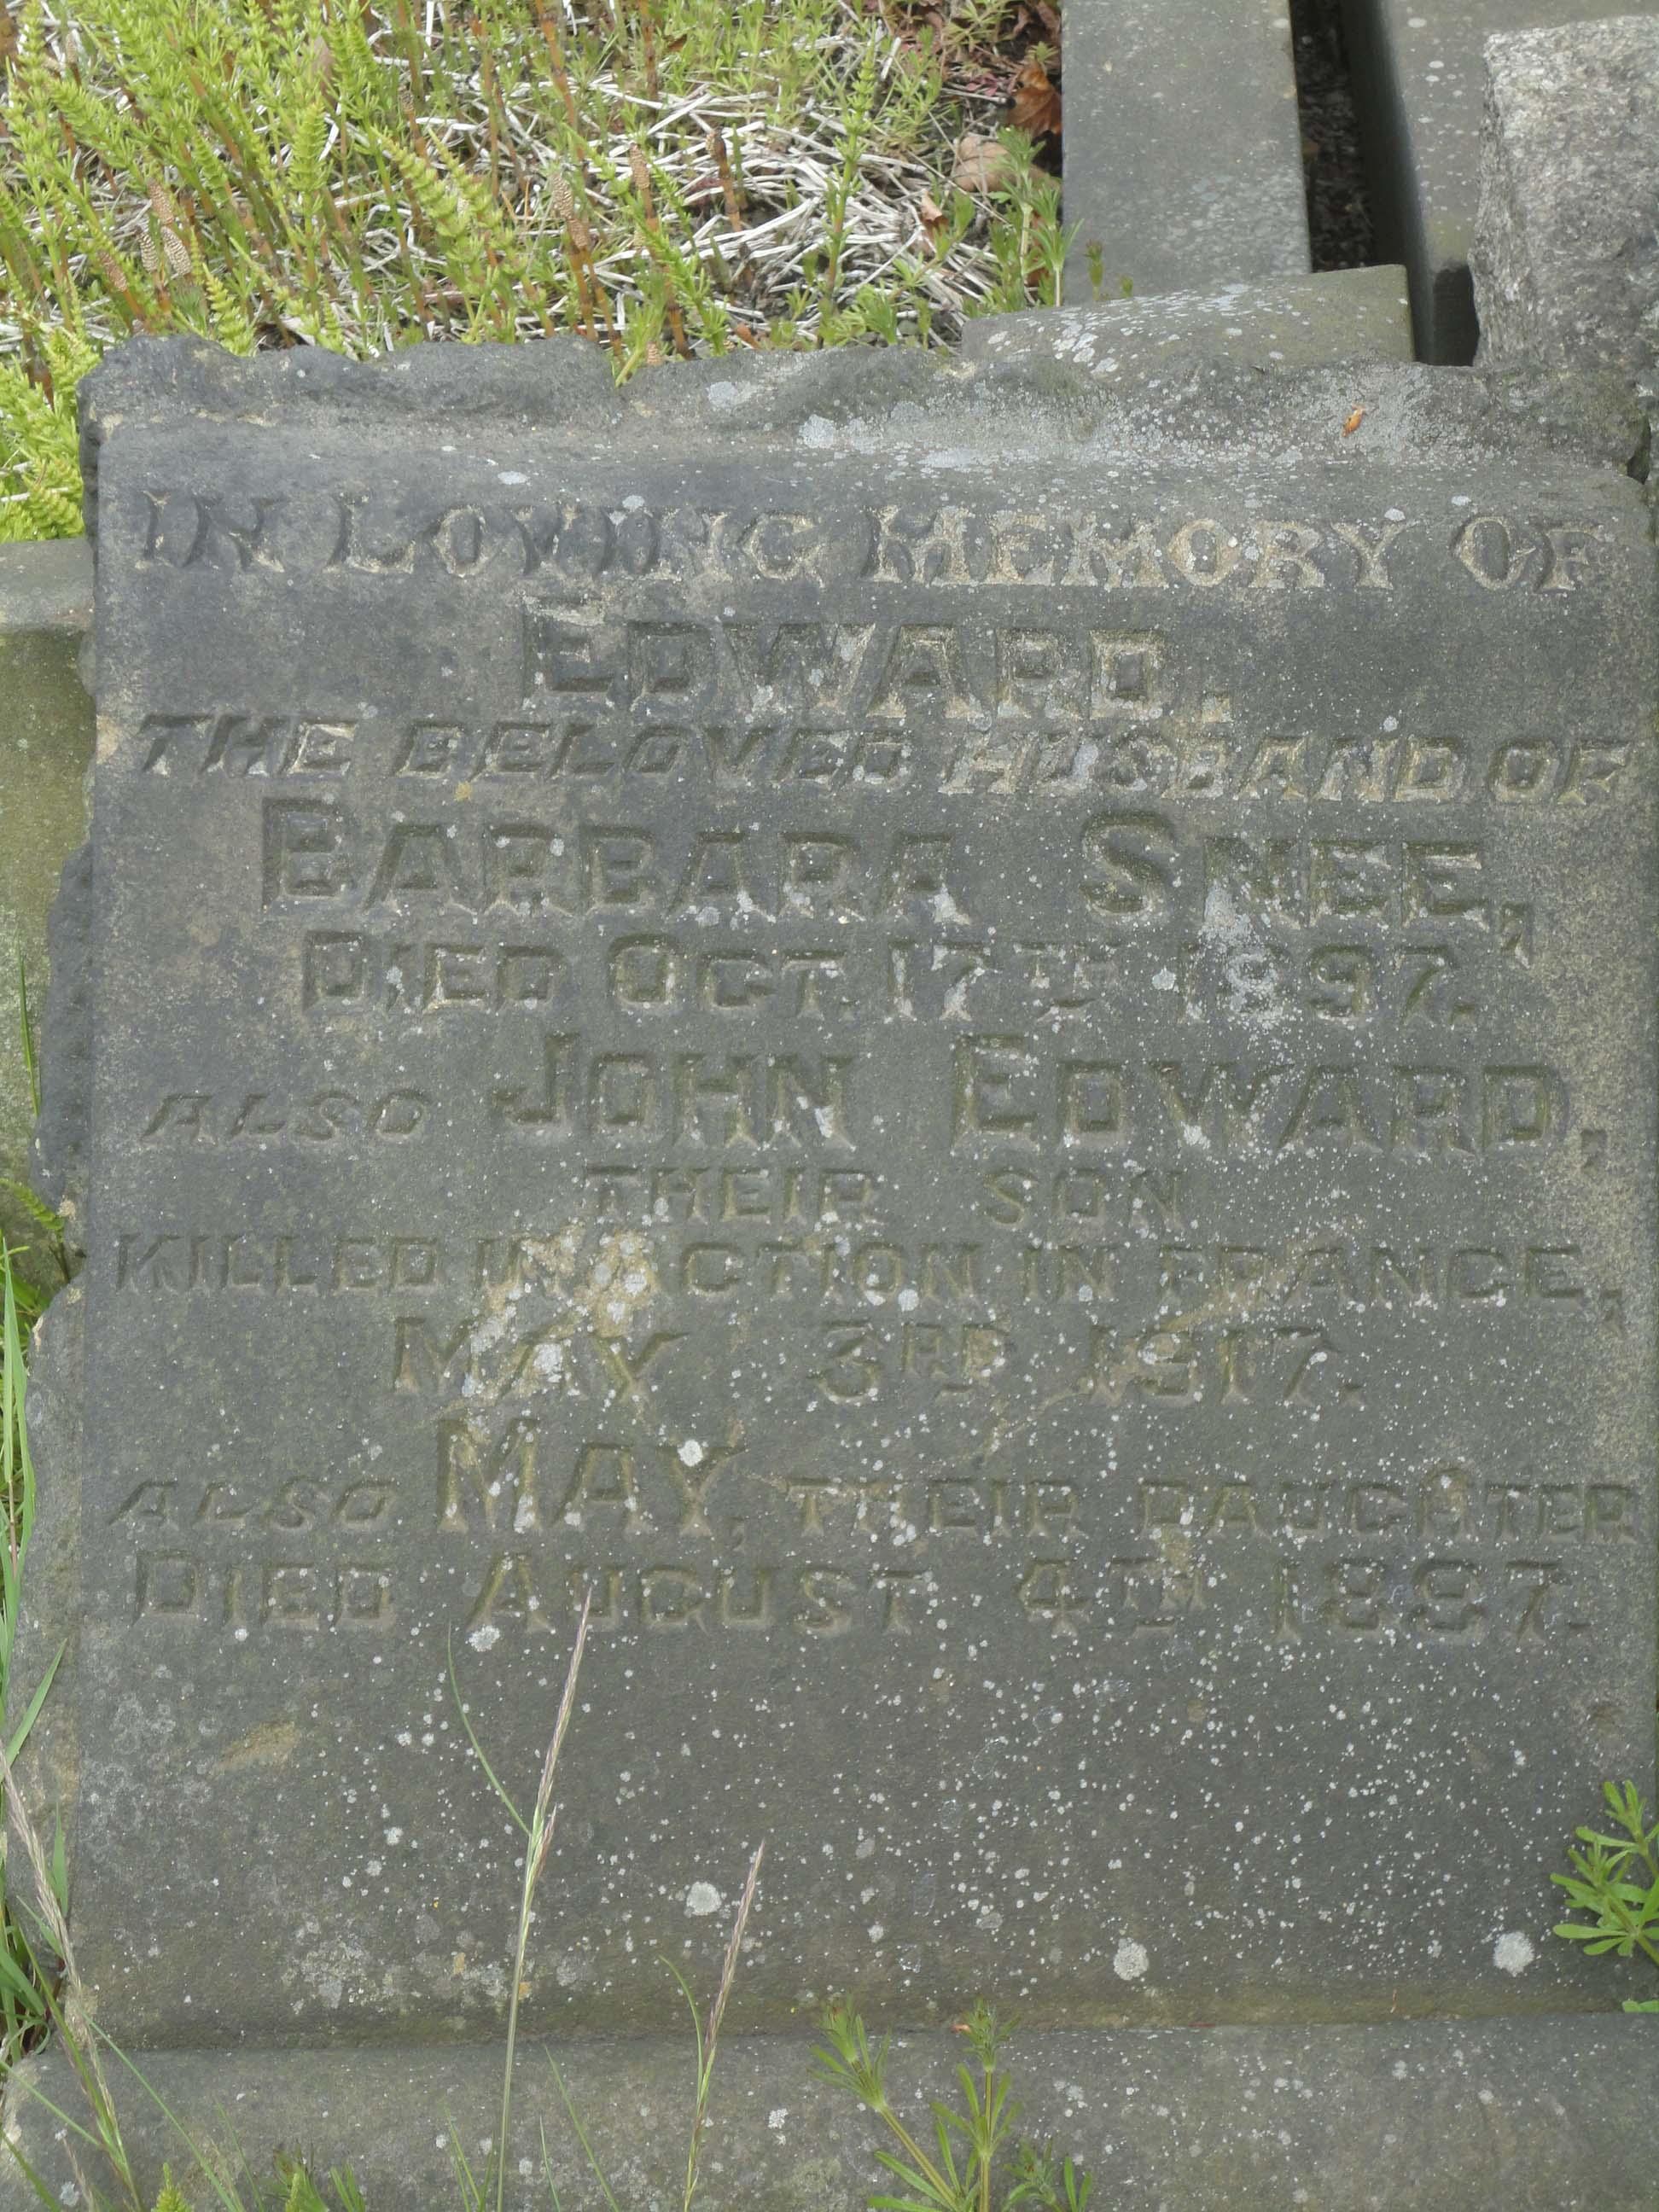 Snee JE inscription